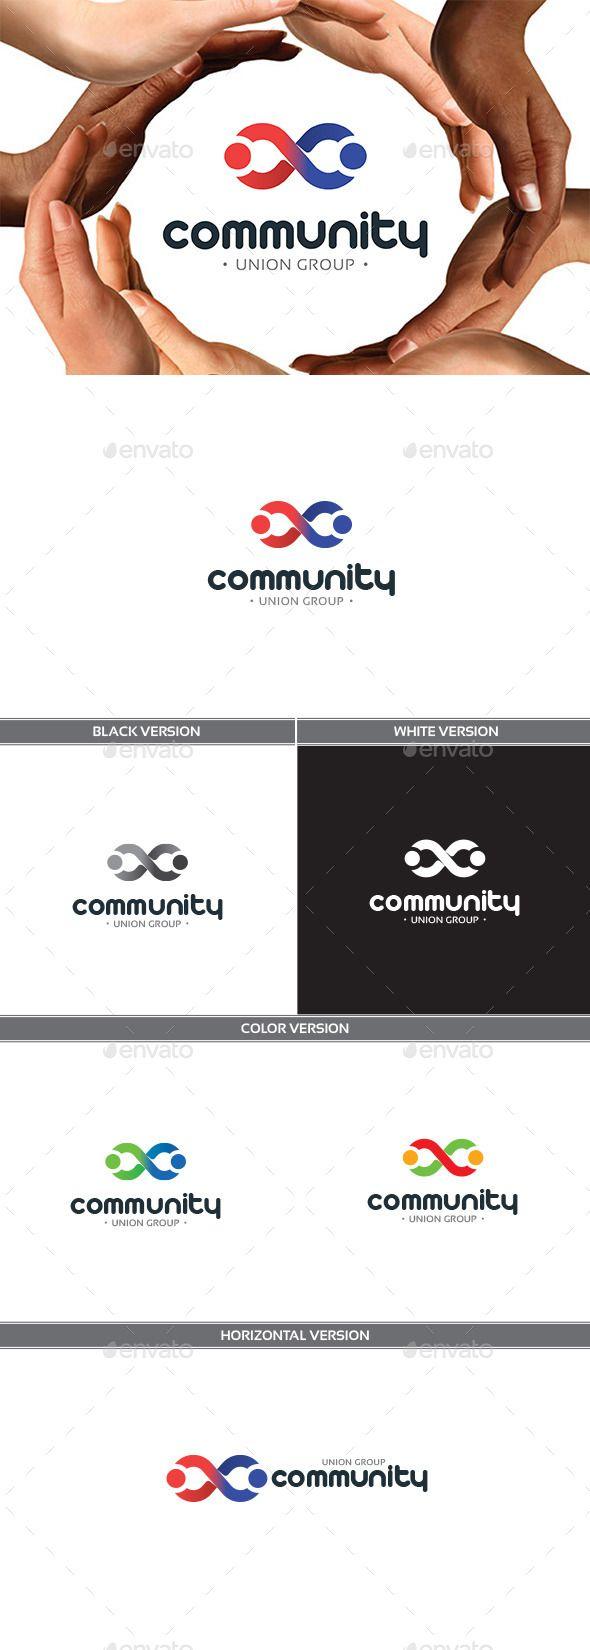 Community Logo Design Template Vector #logotype Download it here: http://graphicriver.net/item/community/11310070?s_rank=912?ref=nexion